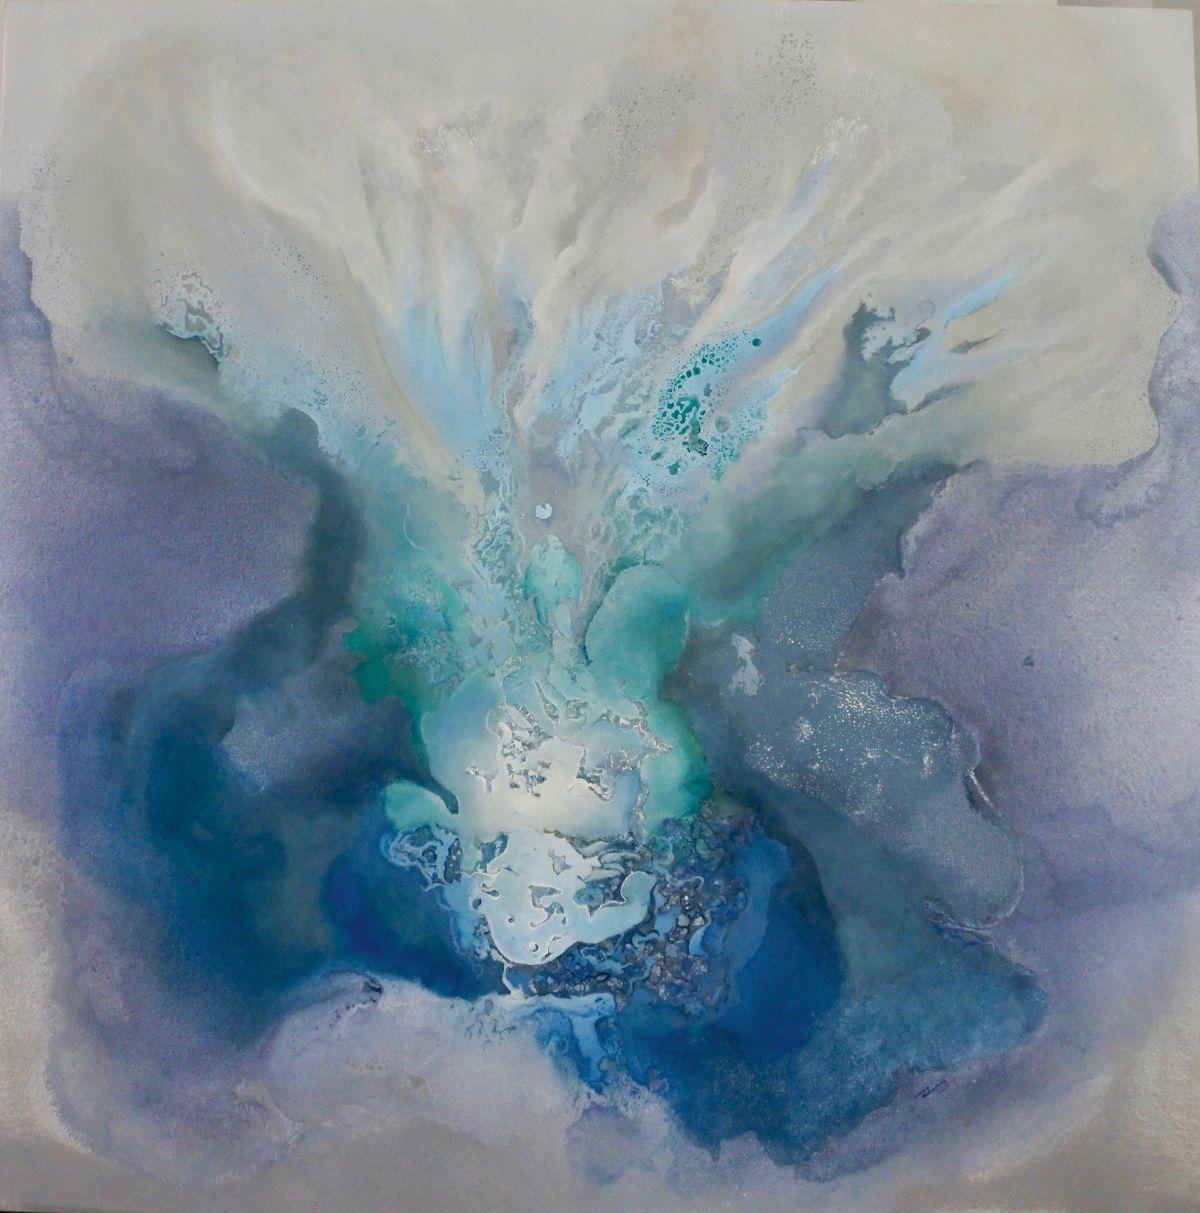 Ignición (2017) - Leonor Hochschild Barroso - Leonor Hochschild